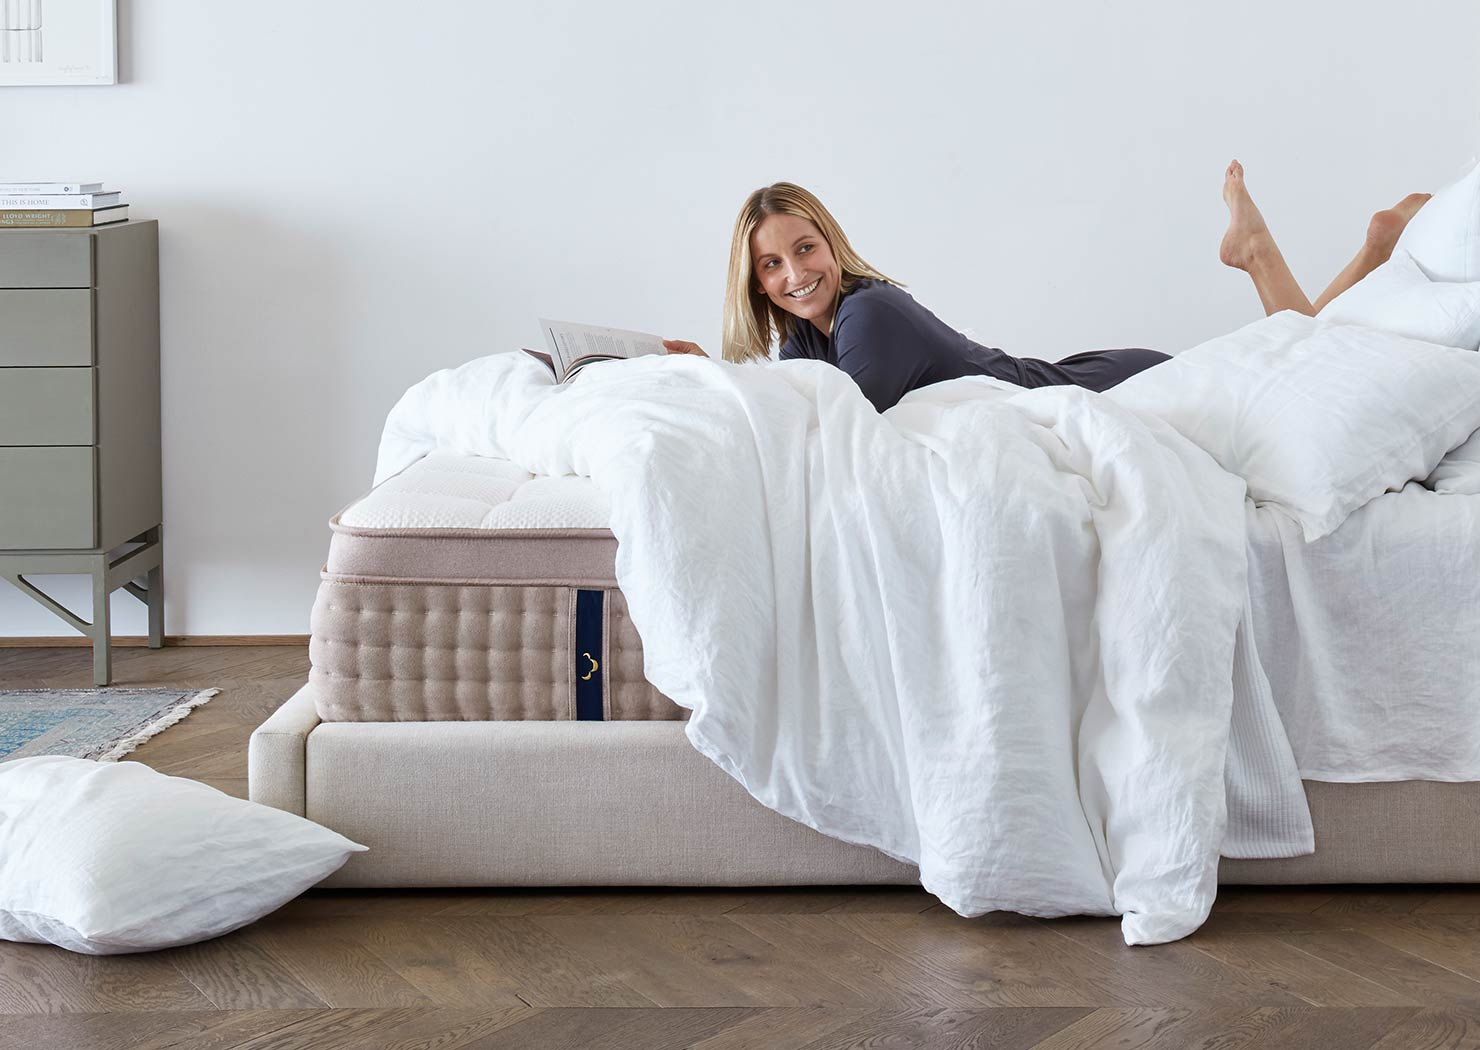 Woman laying on a DreamCloud mattress